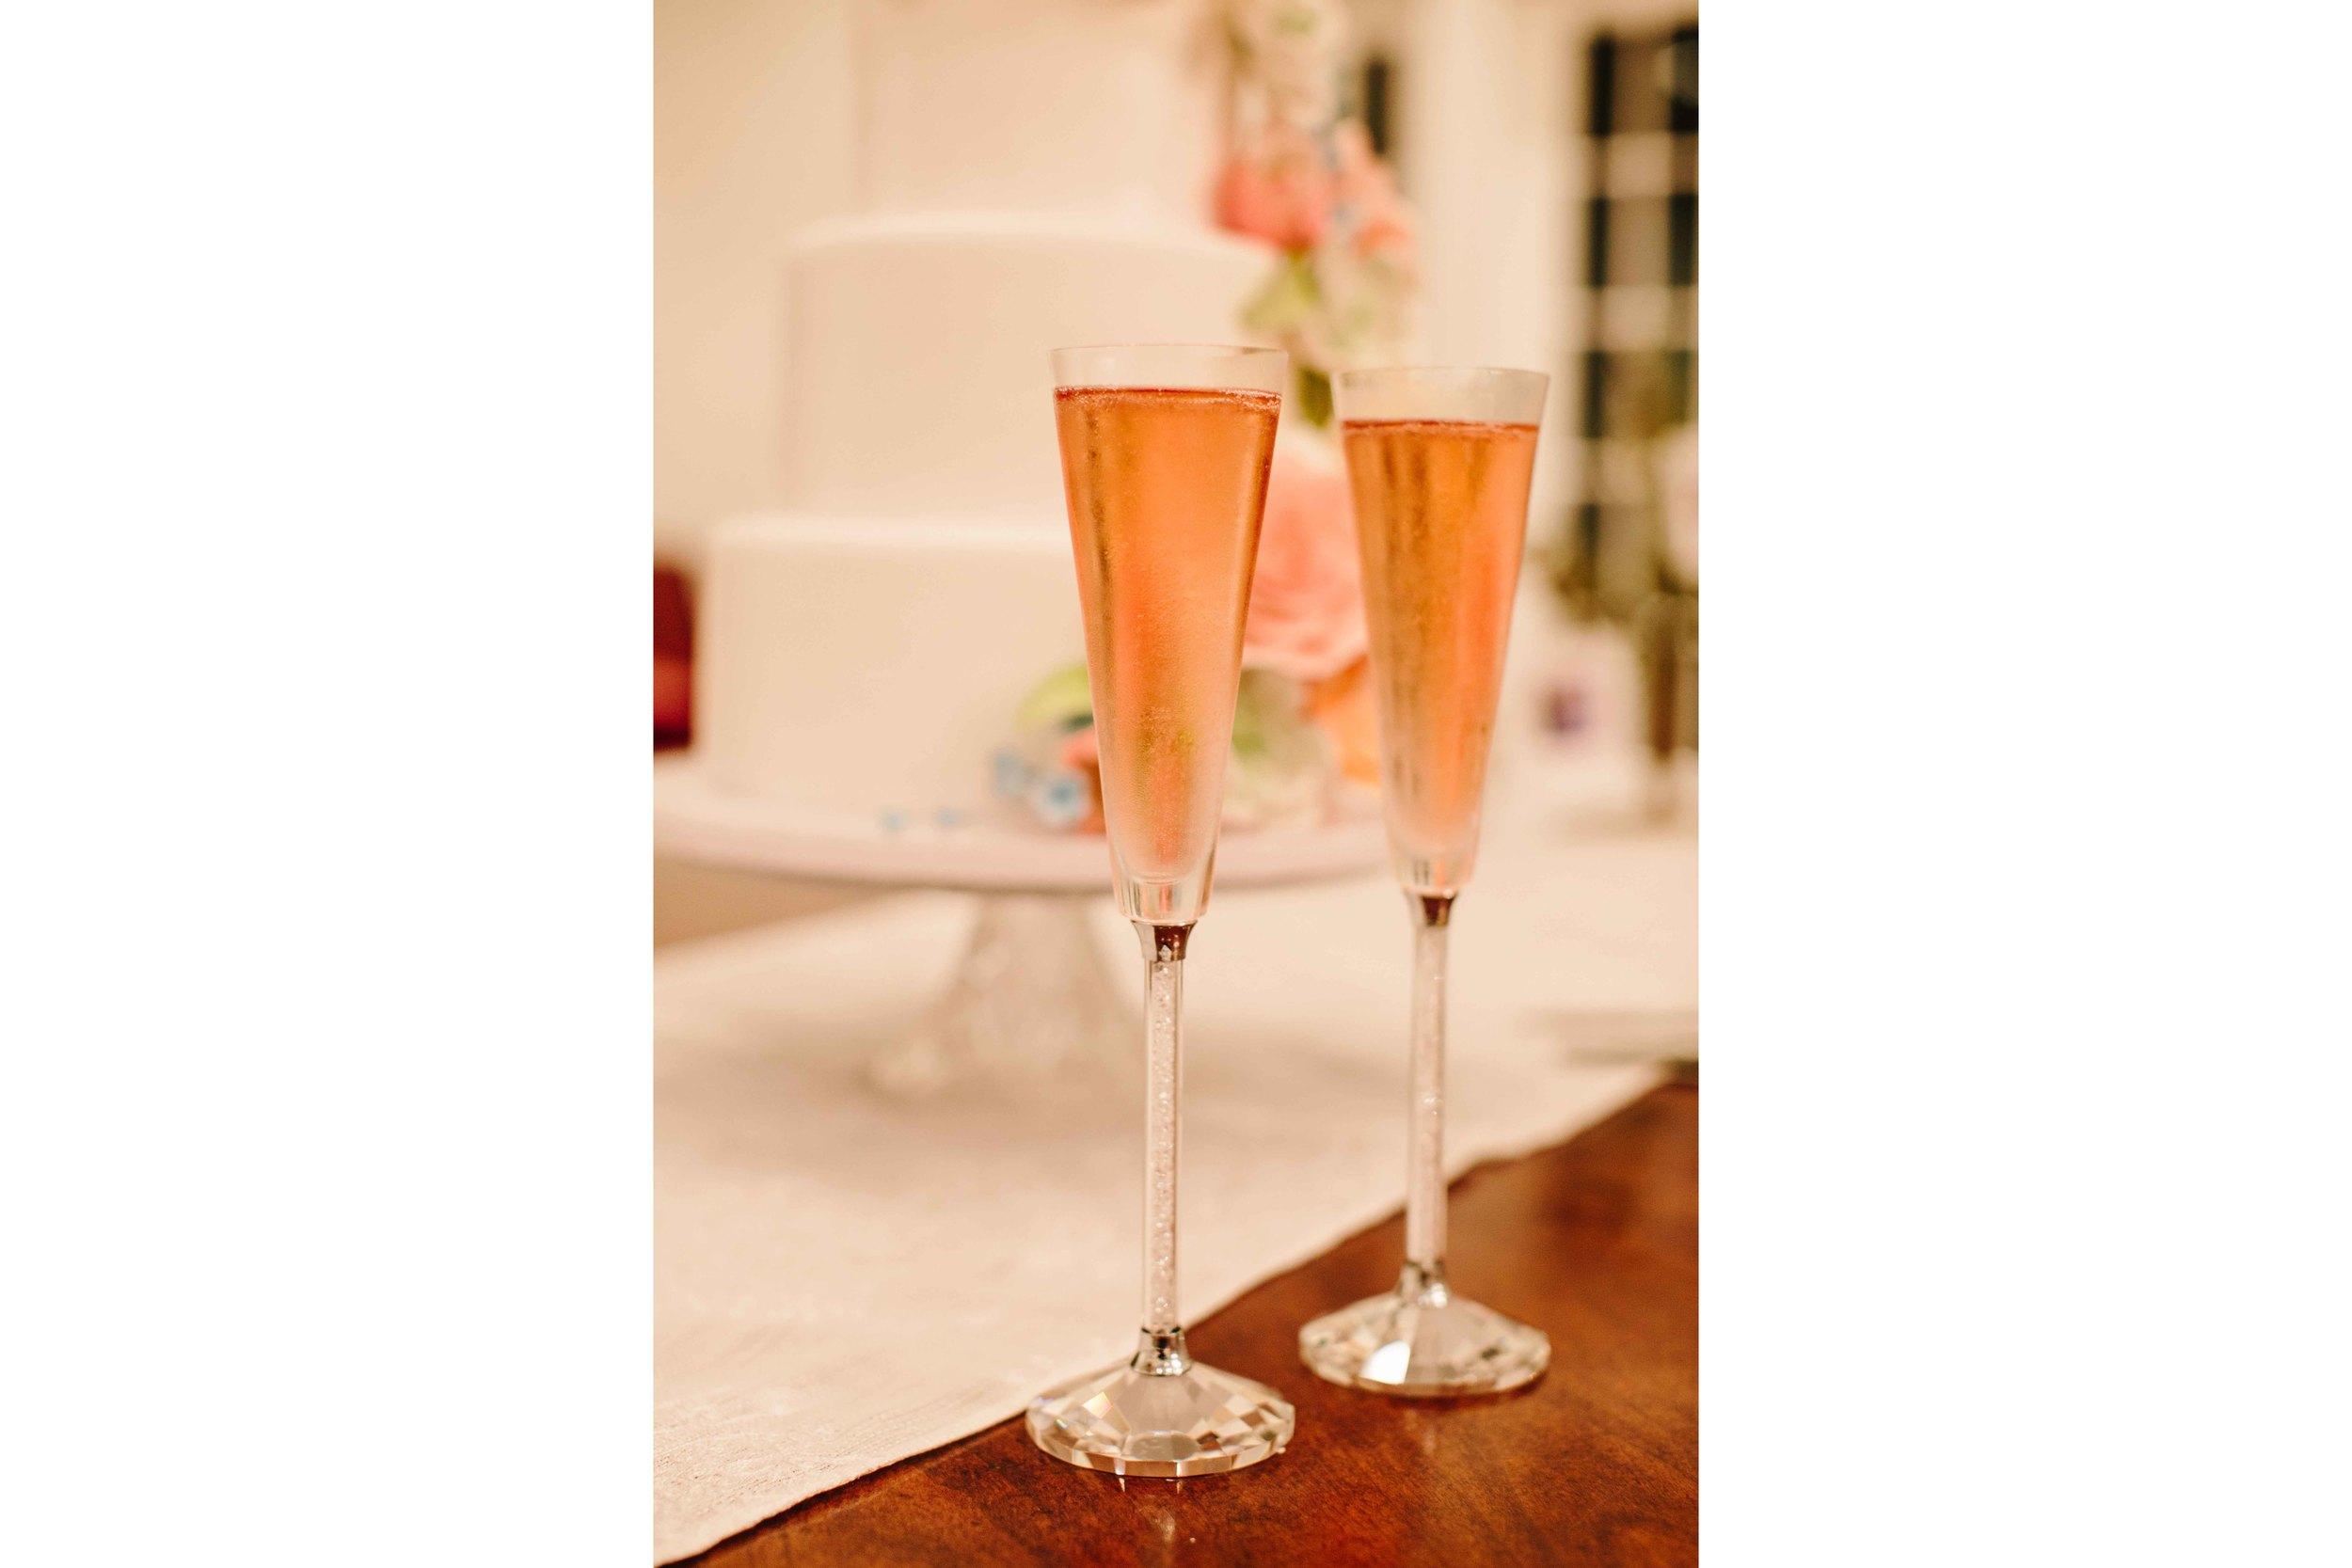 Oahu Wedding Photography - Champagne Glasses